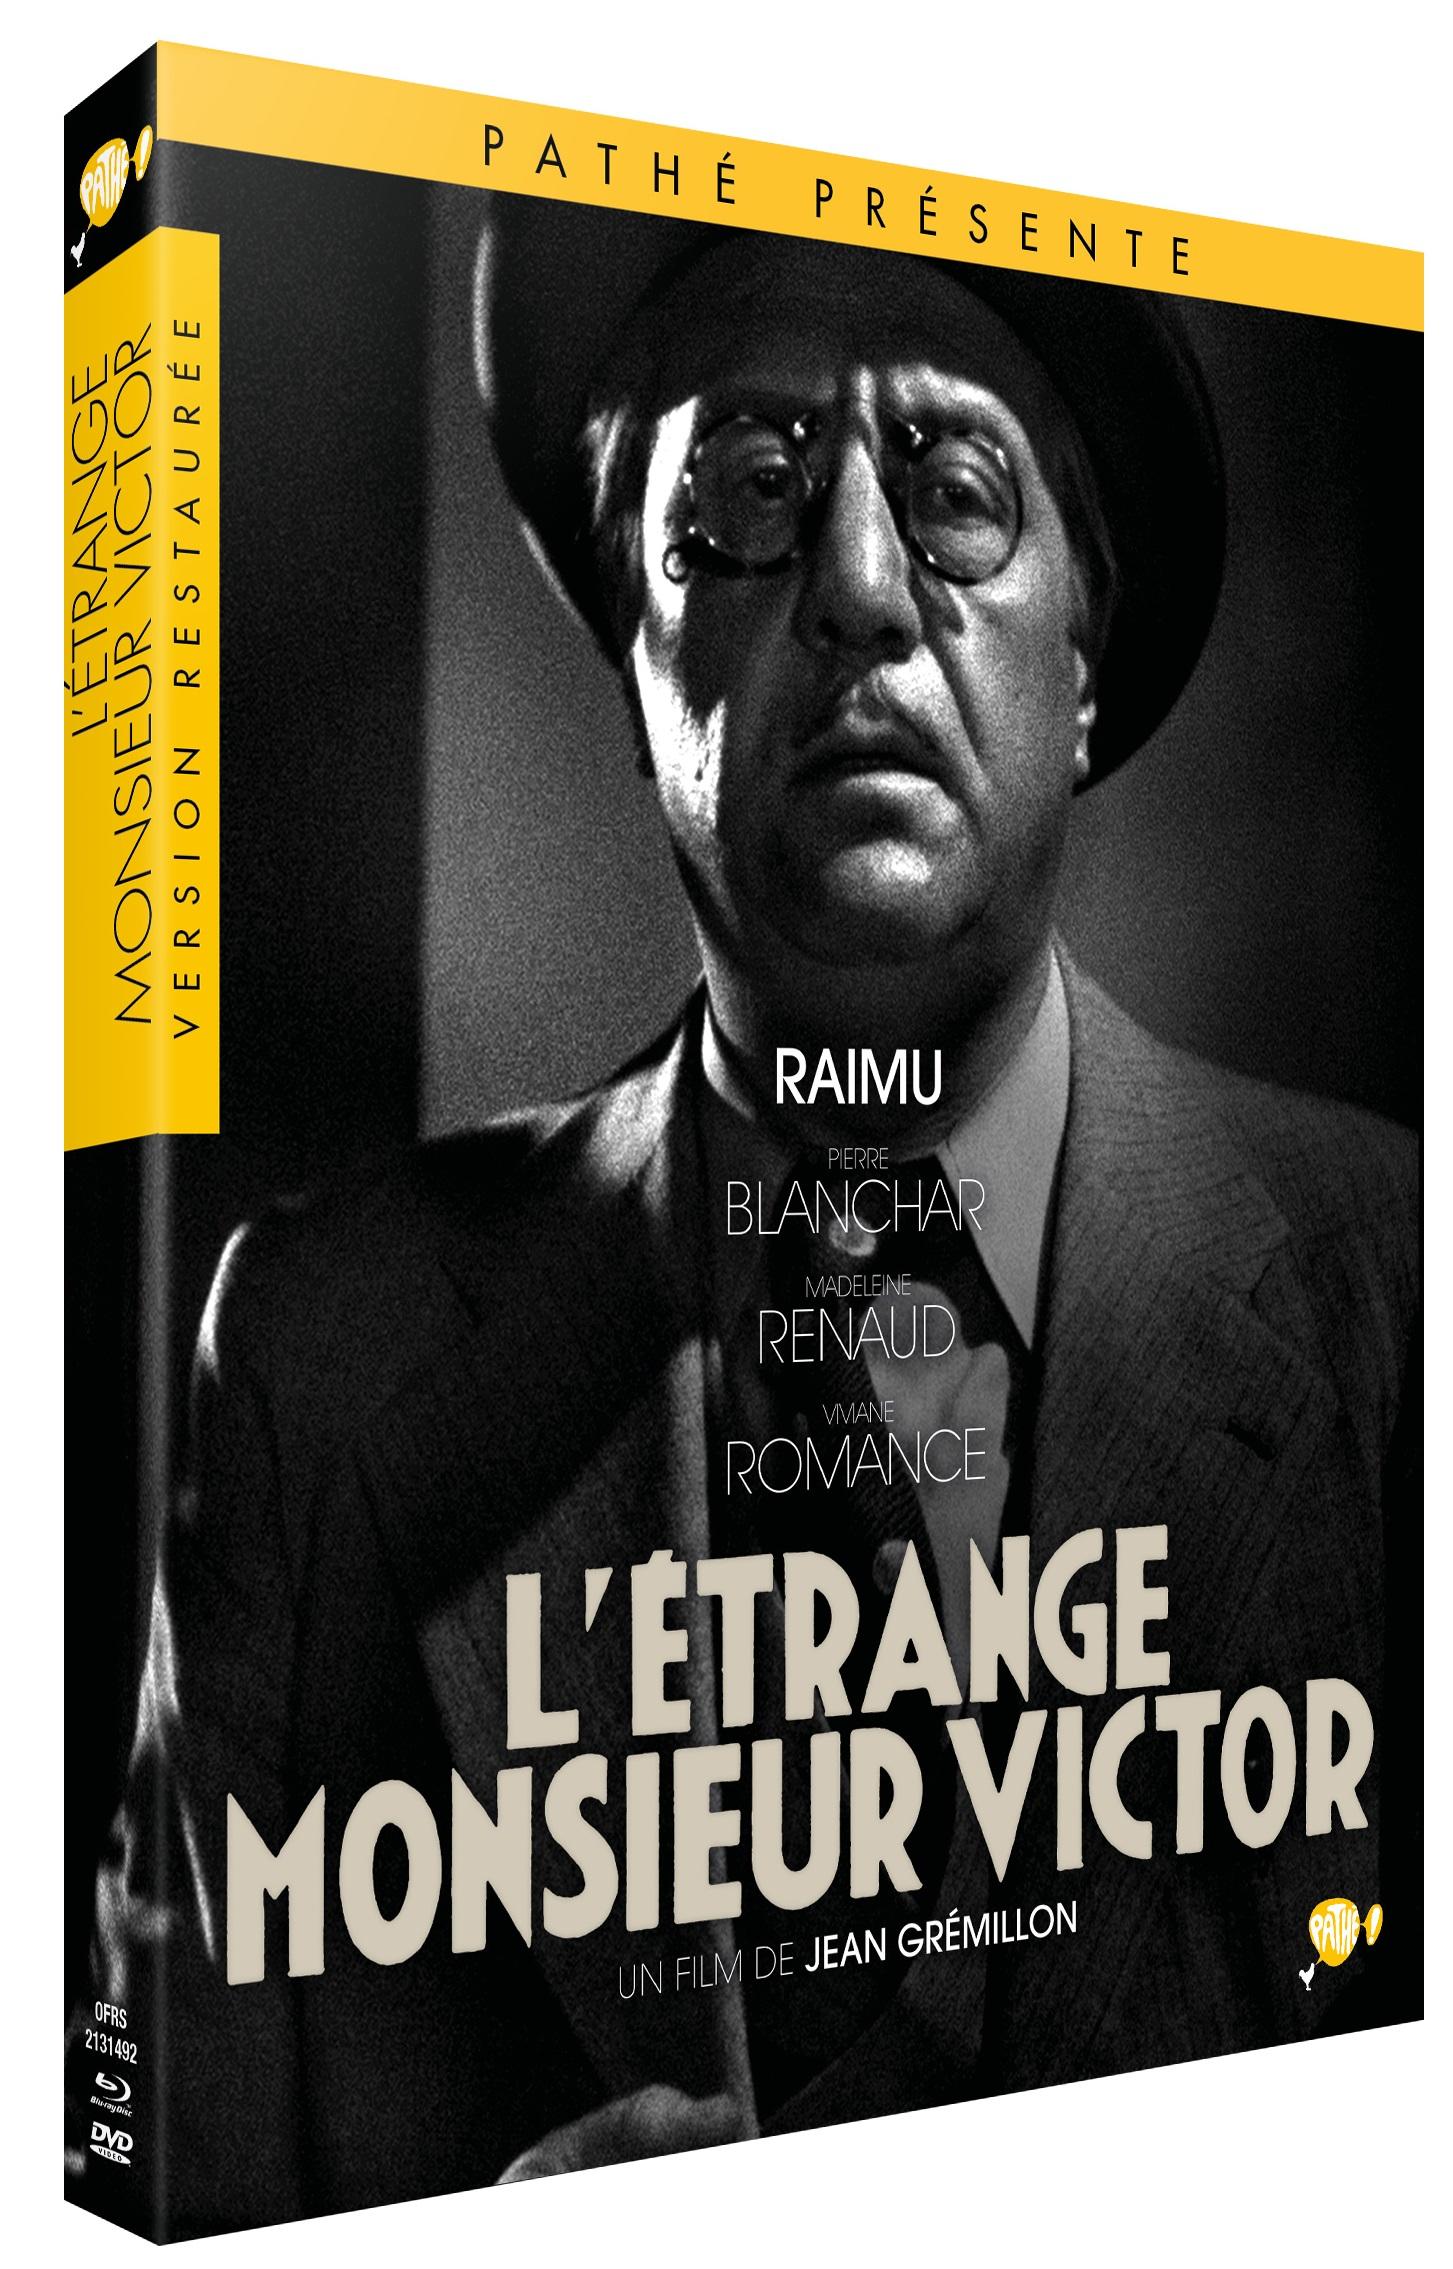 L'ETRANGE MONSIEUR VICTOR - DVD + BLU-RAY